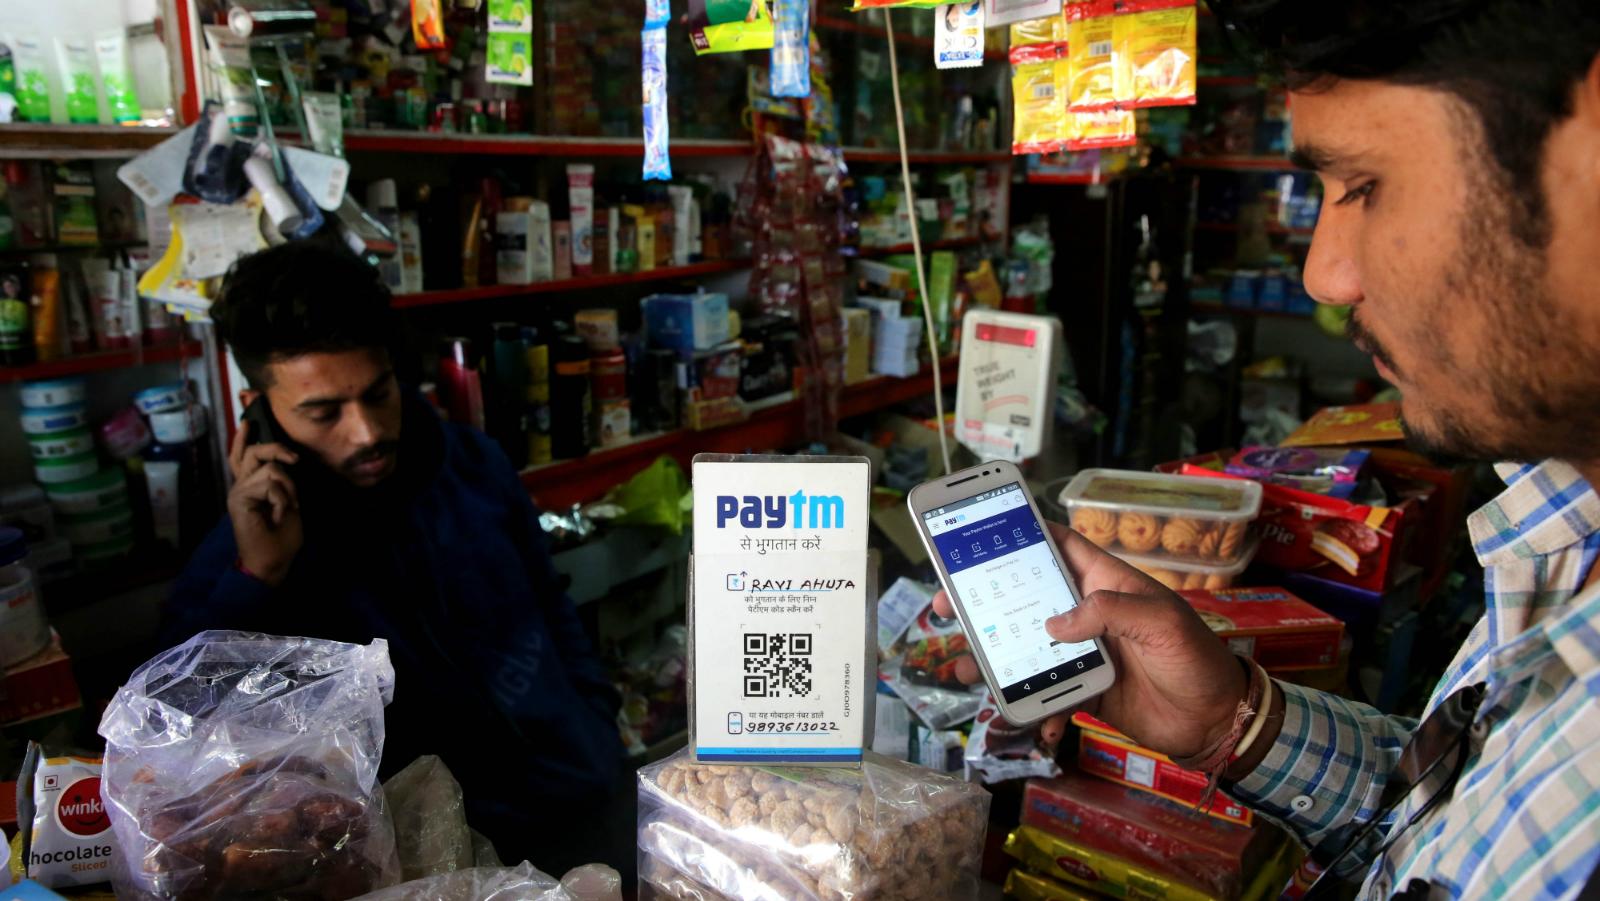 India-BHIM_Paytm-Digital payments-Narendra Modi